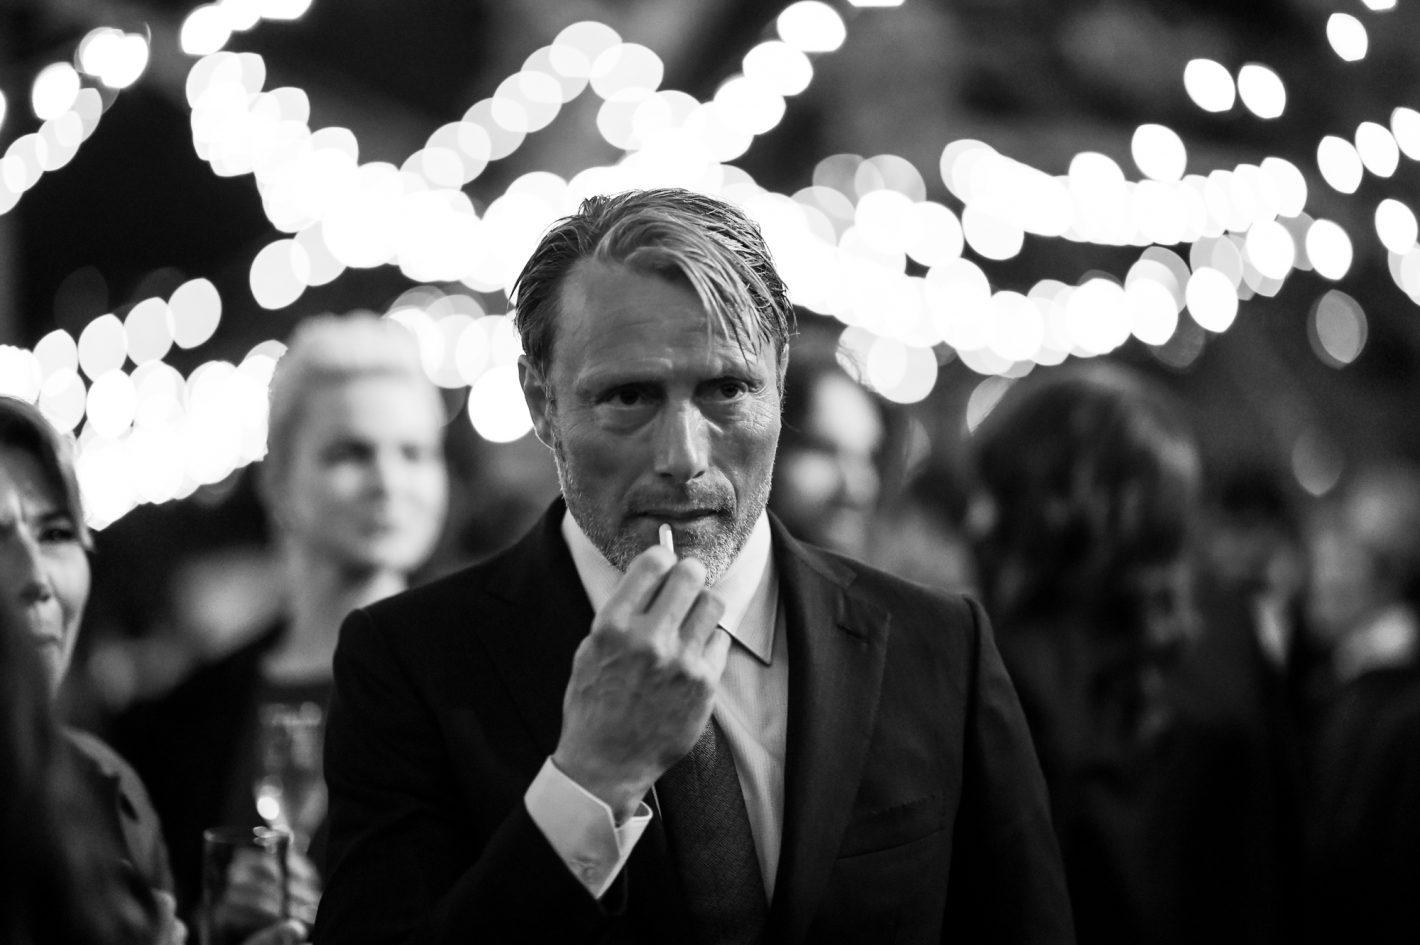 Mads Mikkelsen par Anthony Ghnassia pour Cannes 2018